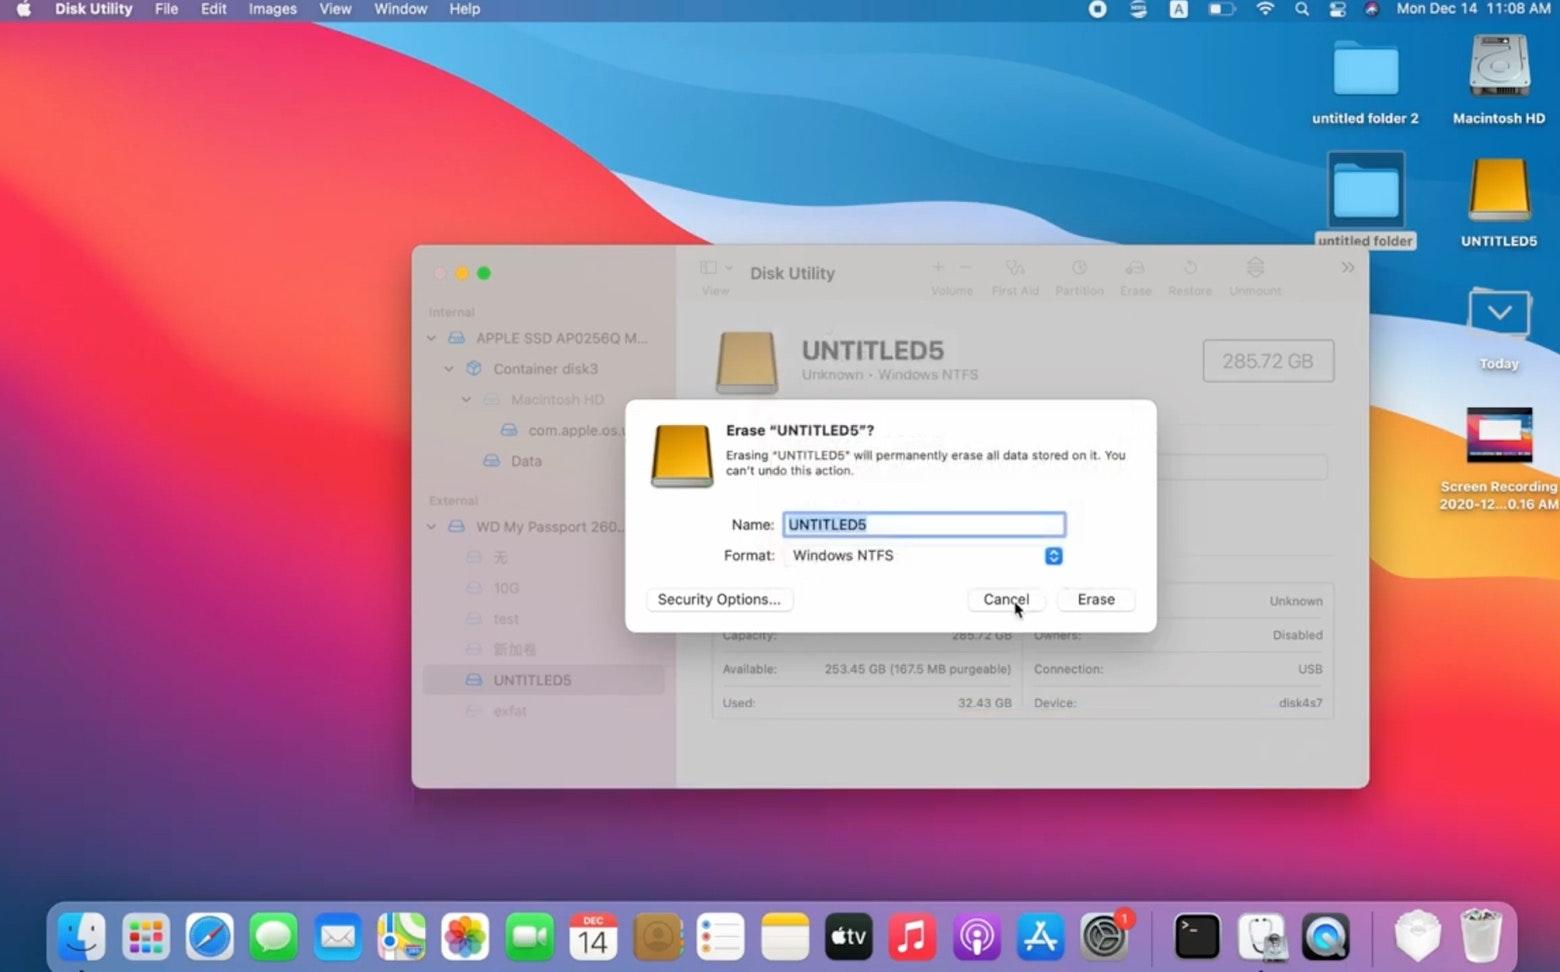 manage NTFS drives on Mac